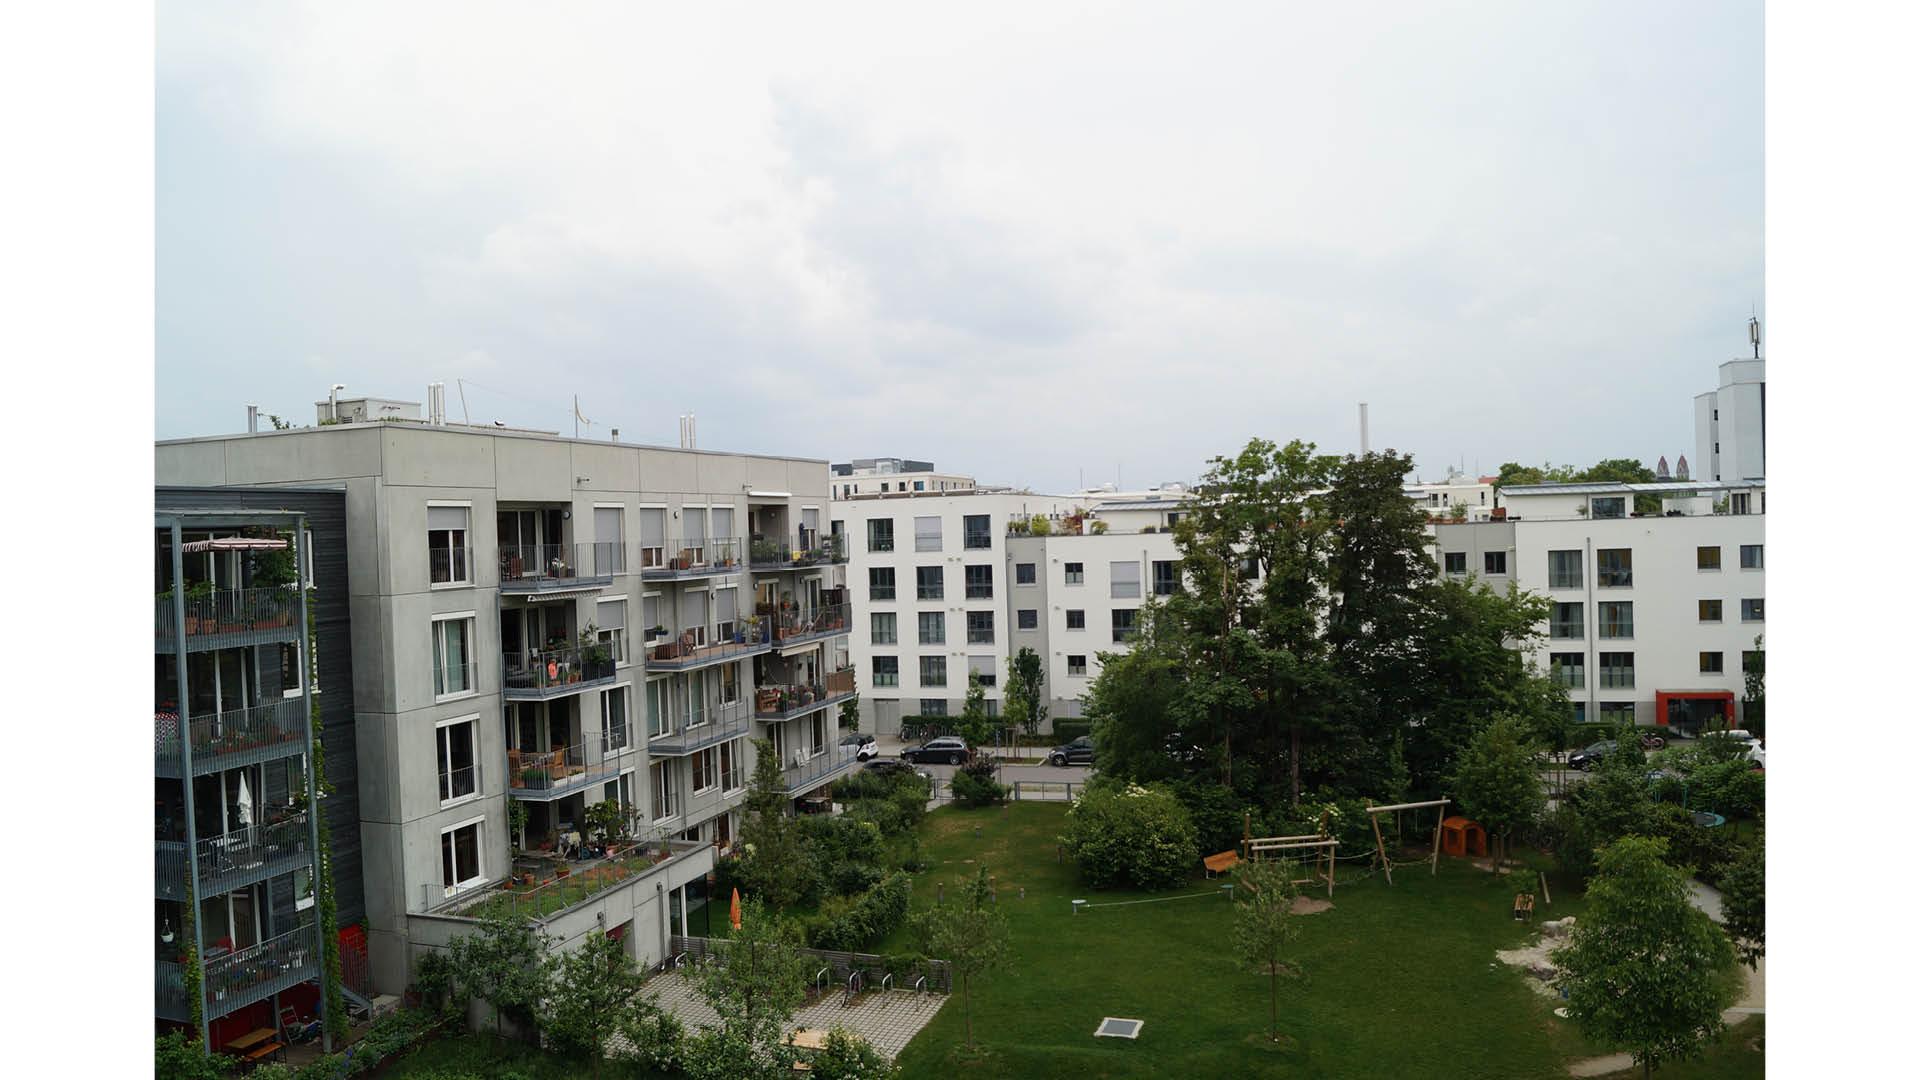 Kompaktsminar Ljubljana 2018 18